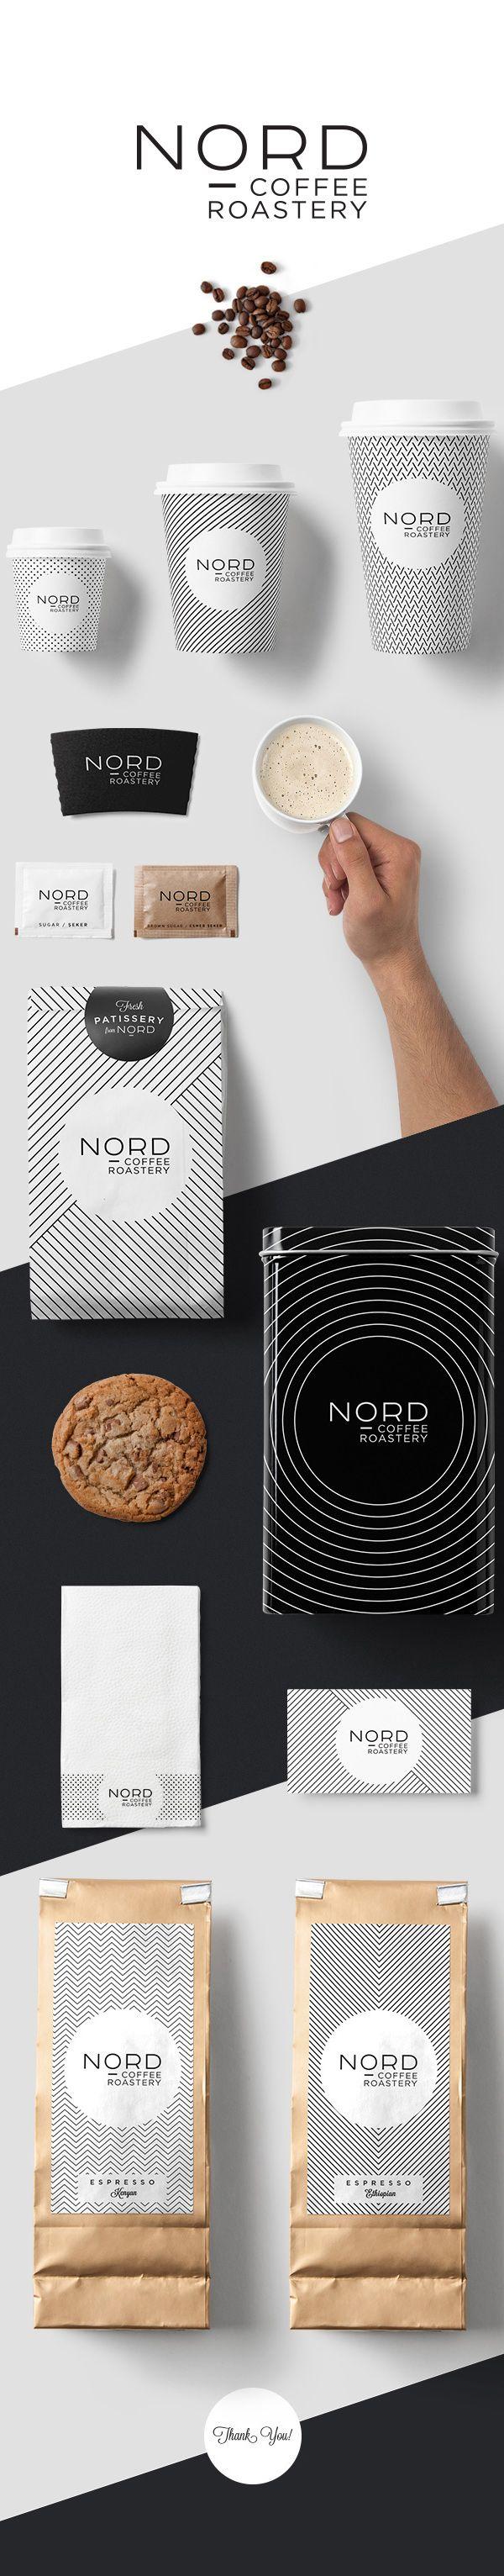 NORD Coffee Roastery by Kutan URAL